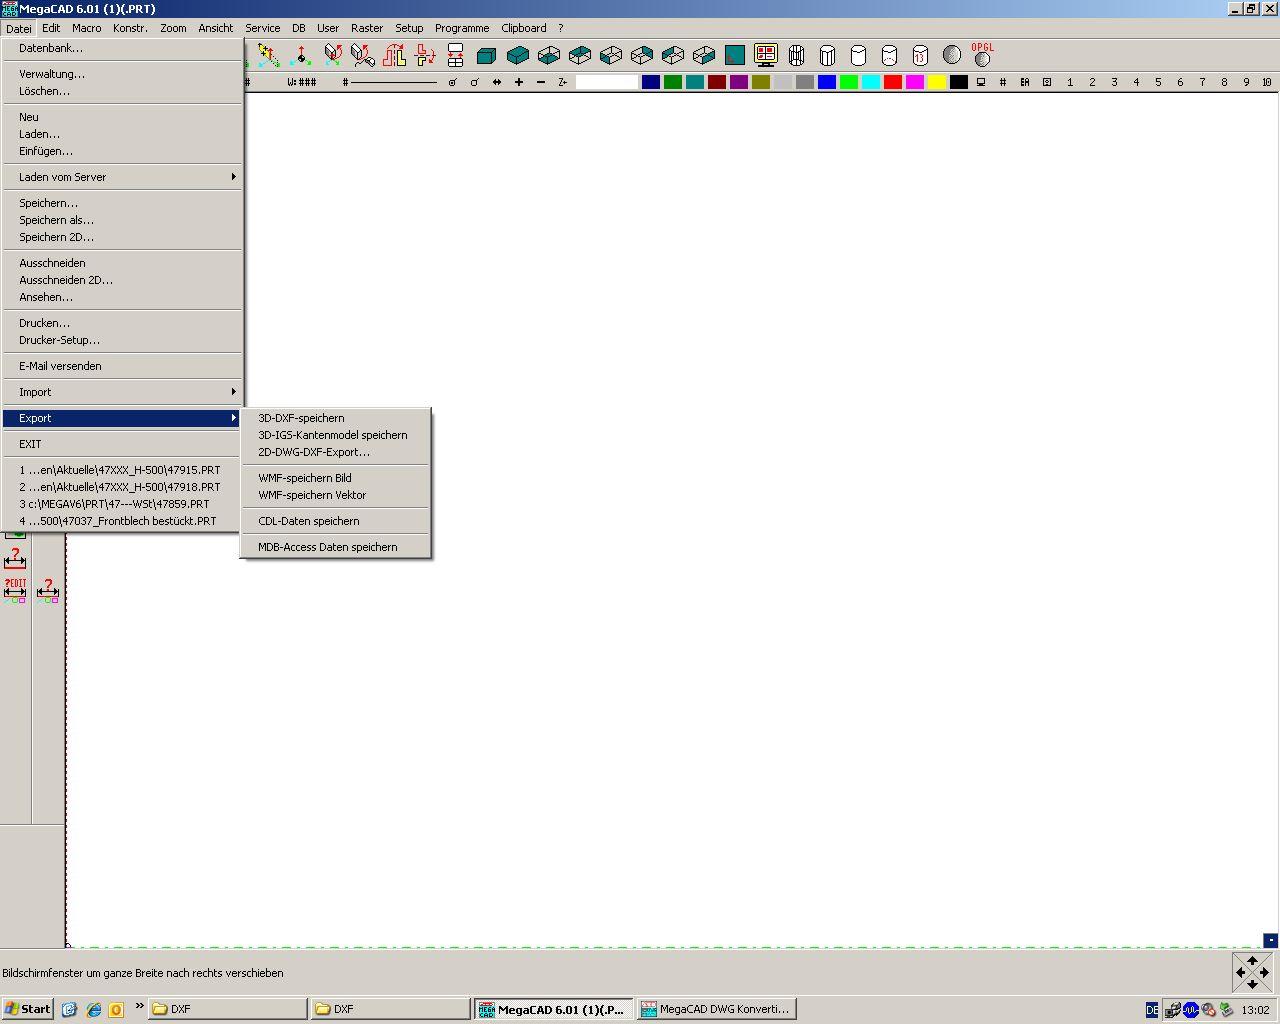 Umwandeln (CAD sonstige/MegaCAD) - Foren auf CAD.de